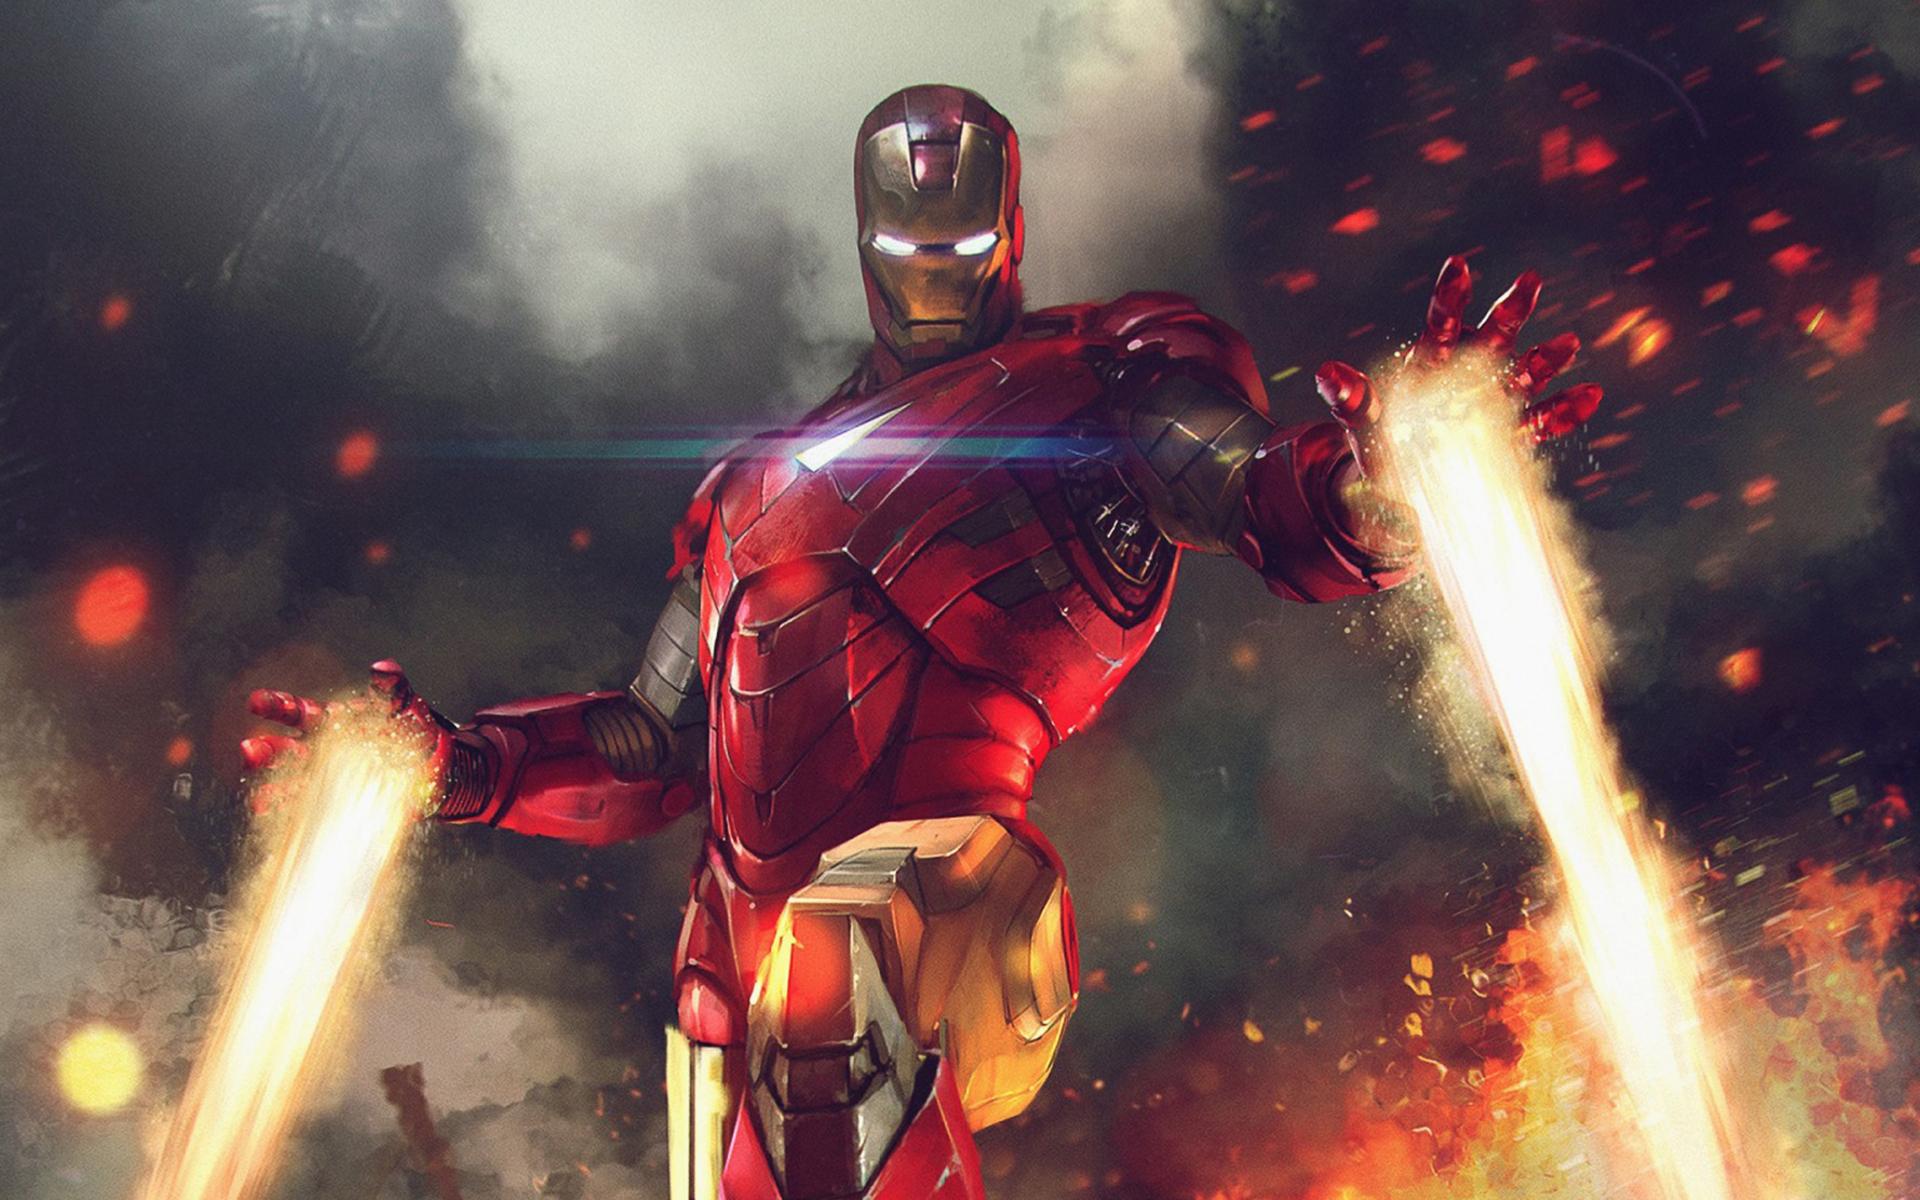 Iron Man Wallpaper 34447: 1920x1200 Iron Man Marvel War Of Heroes 1080P Resolution